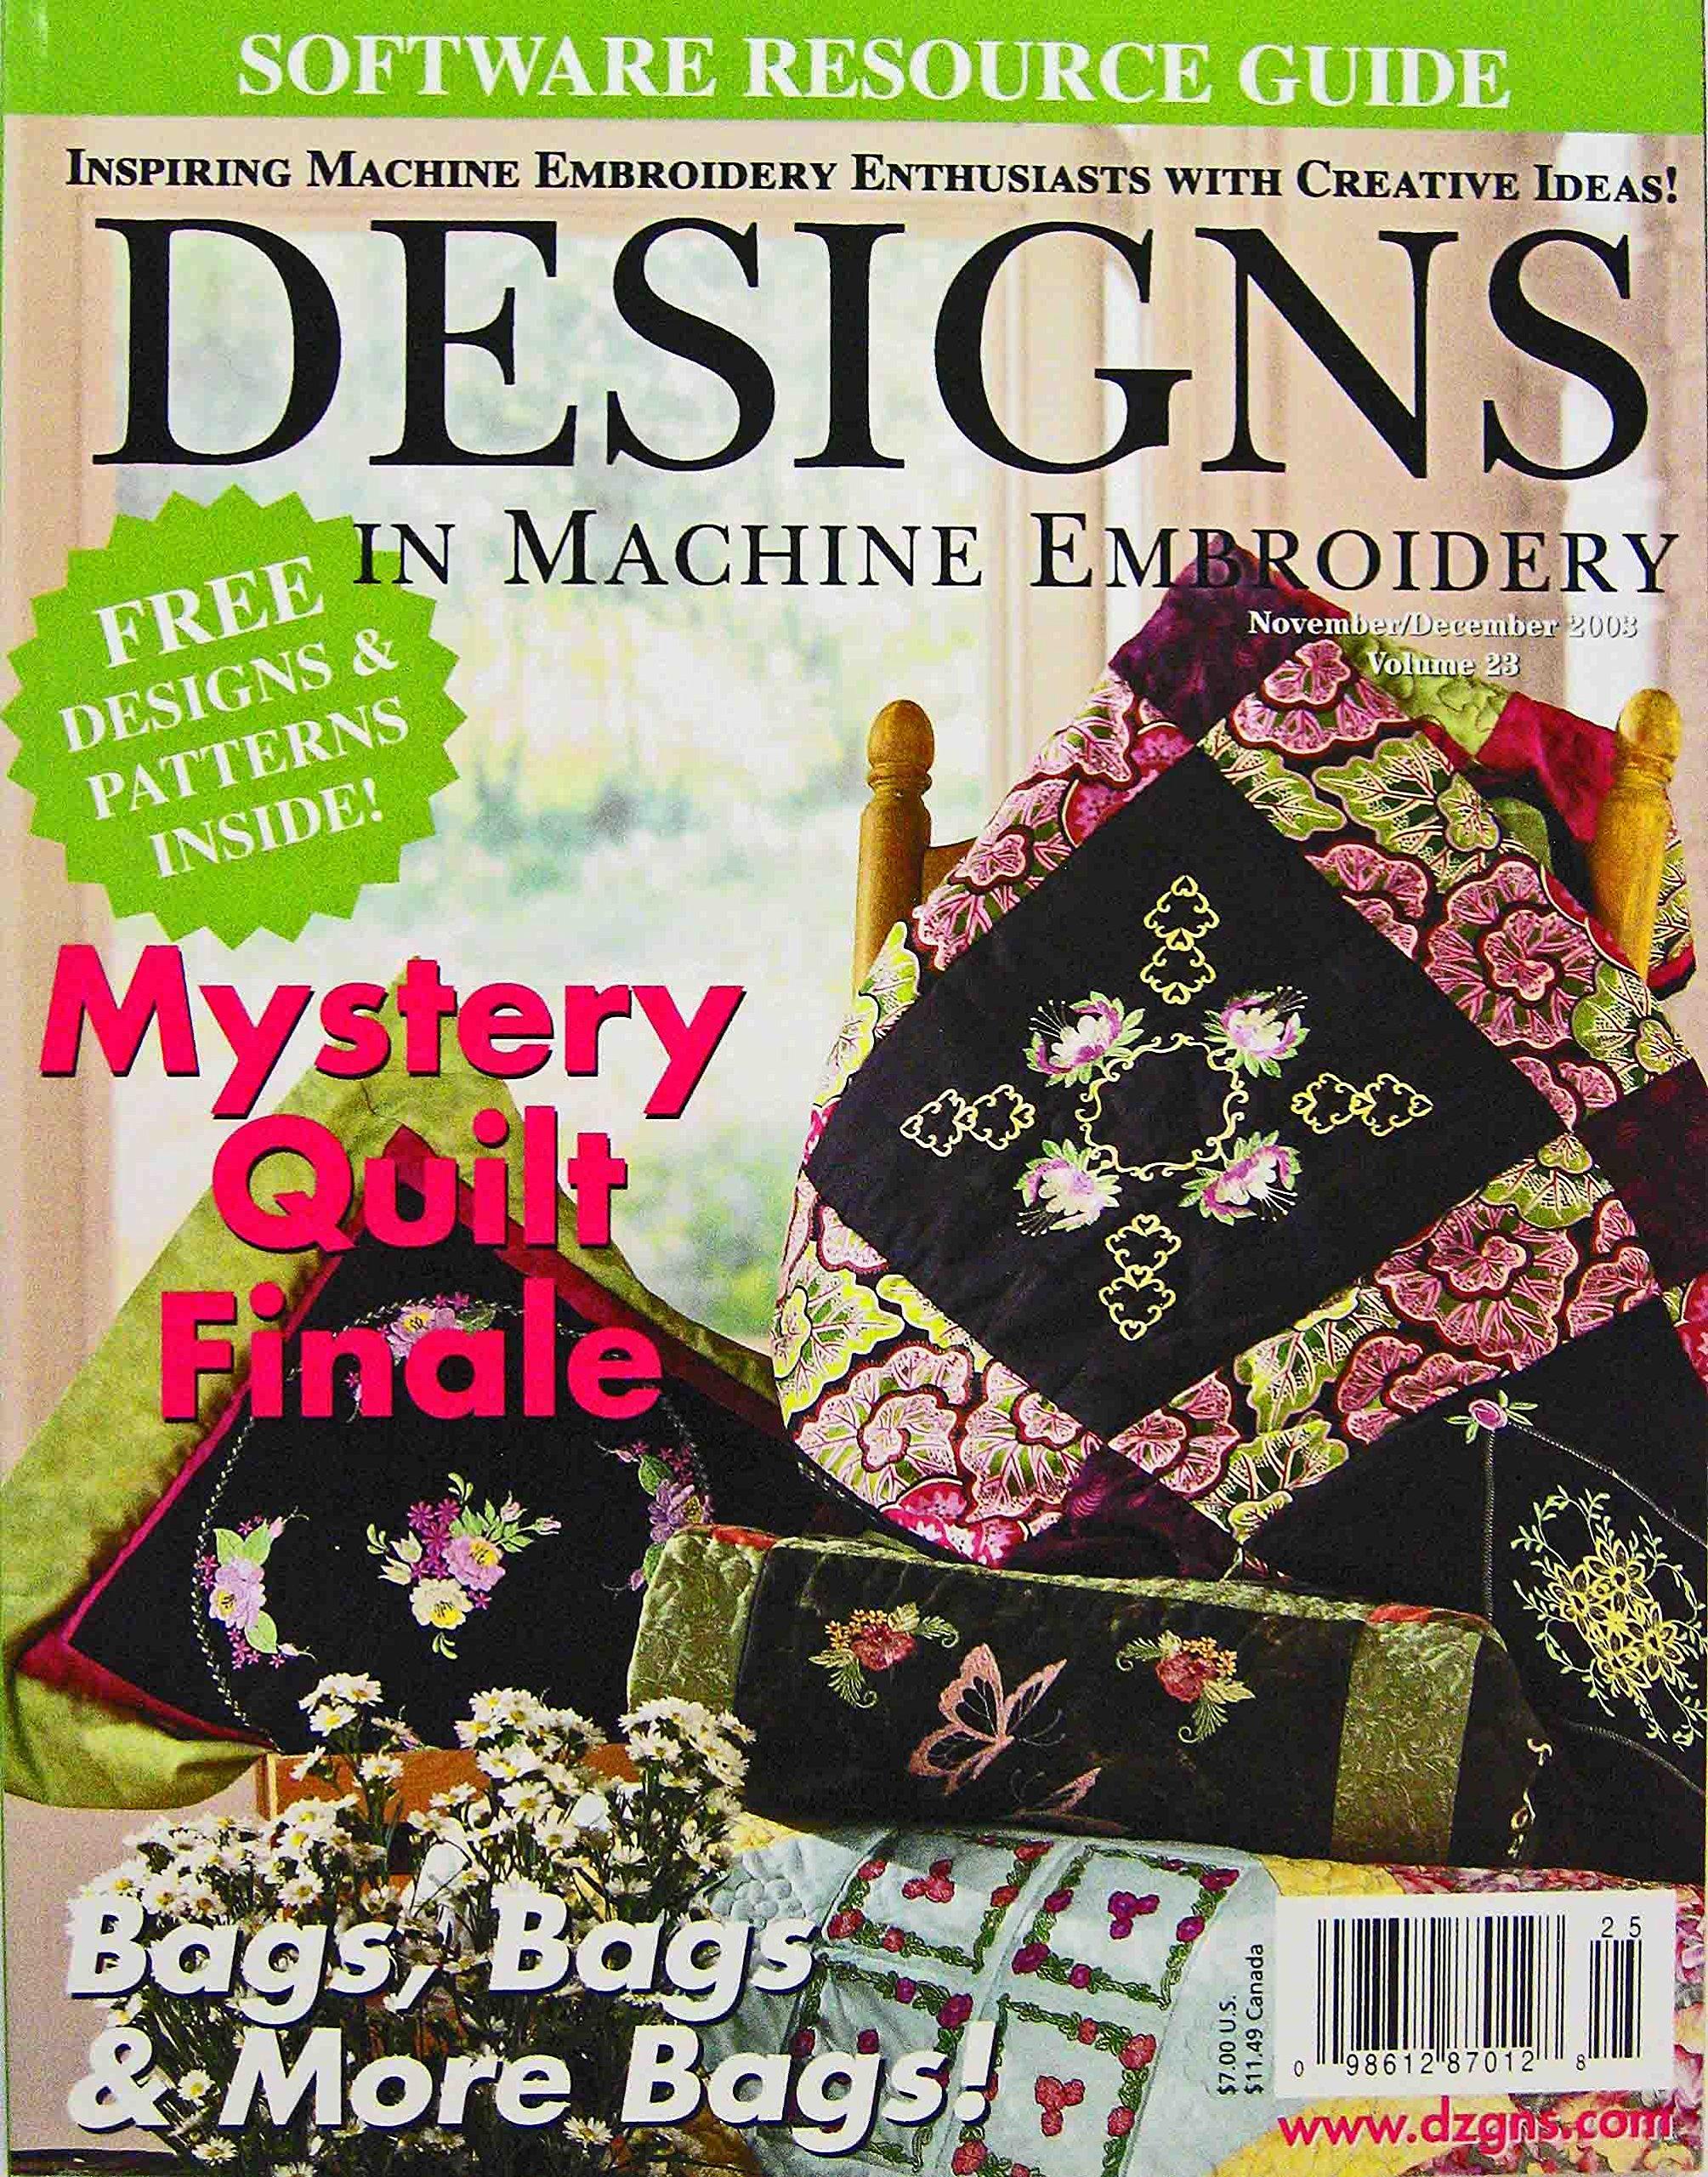 Designs In Machine Embroidery, November/December 2003, Vol